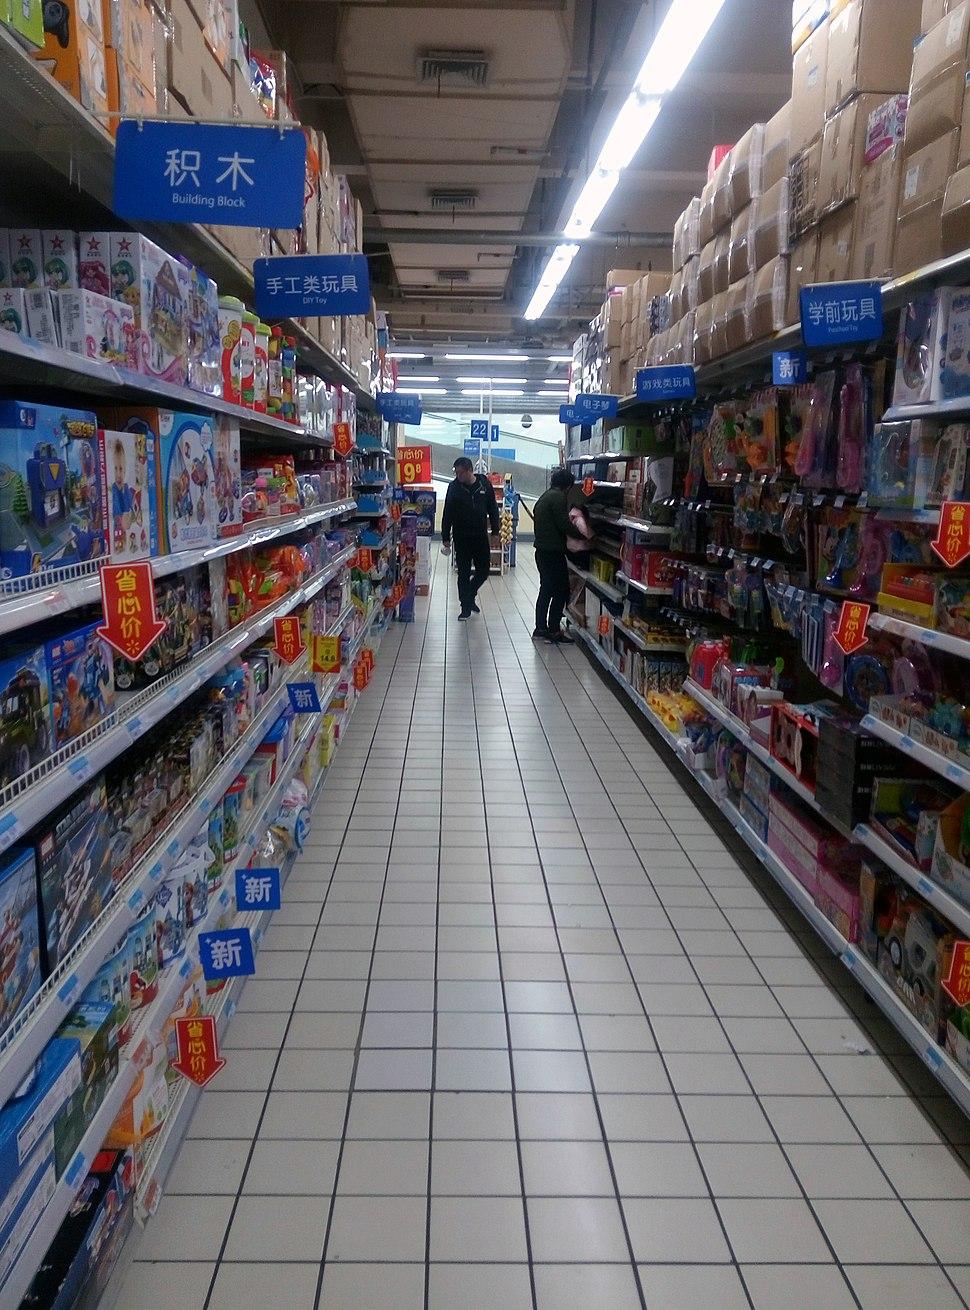 20170212 Bilingual signs in Walmart Hangzhou Toys